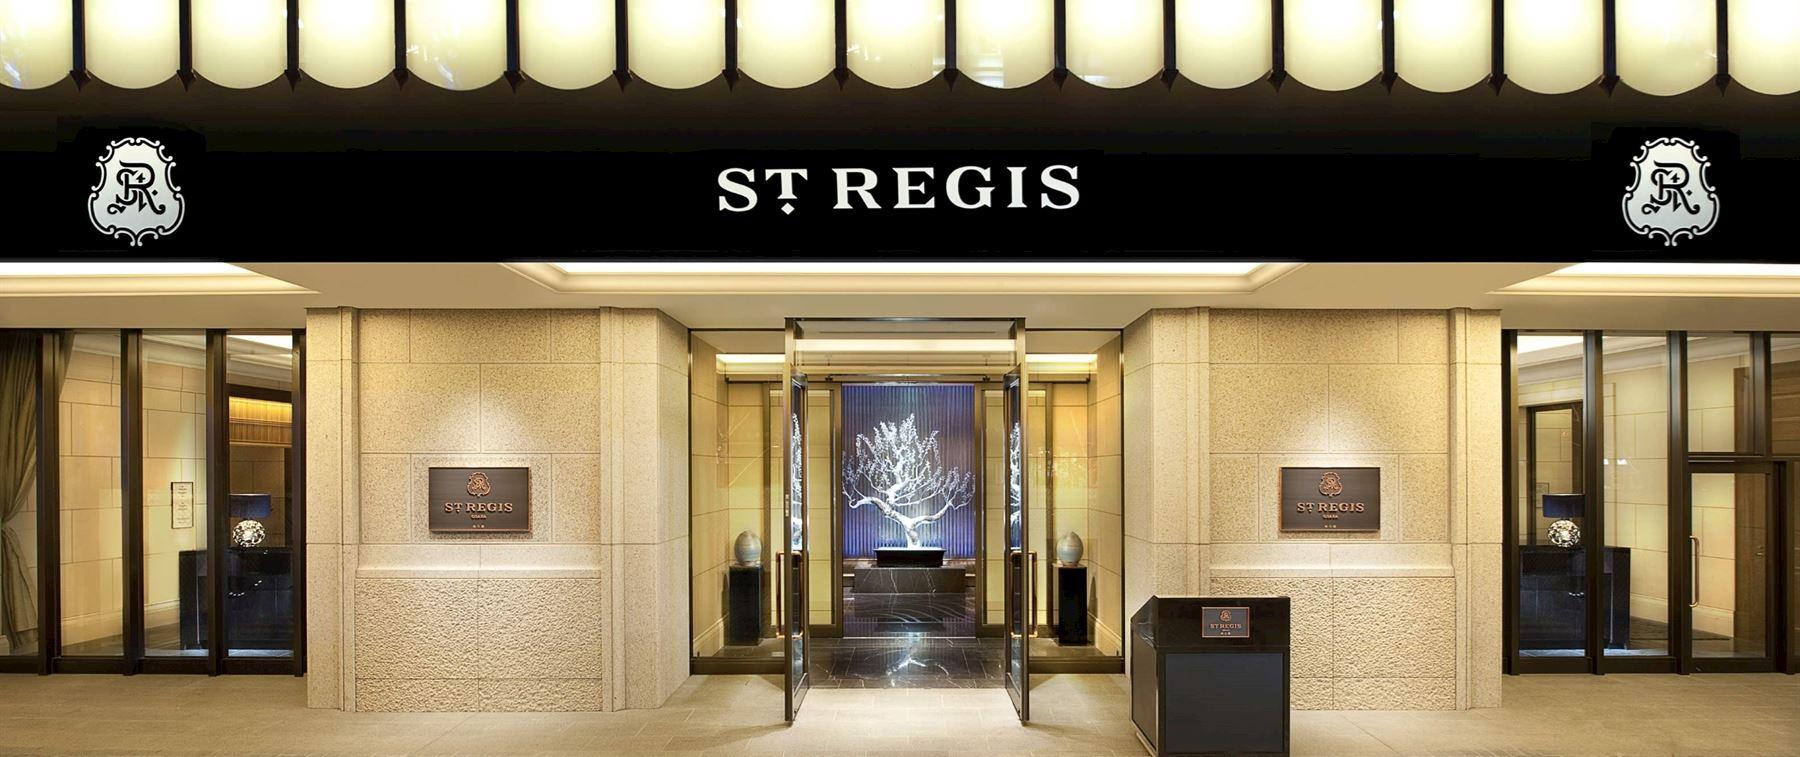 The St. Regis Osaka Entrance